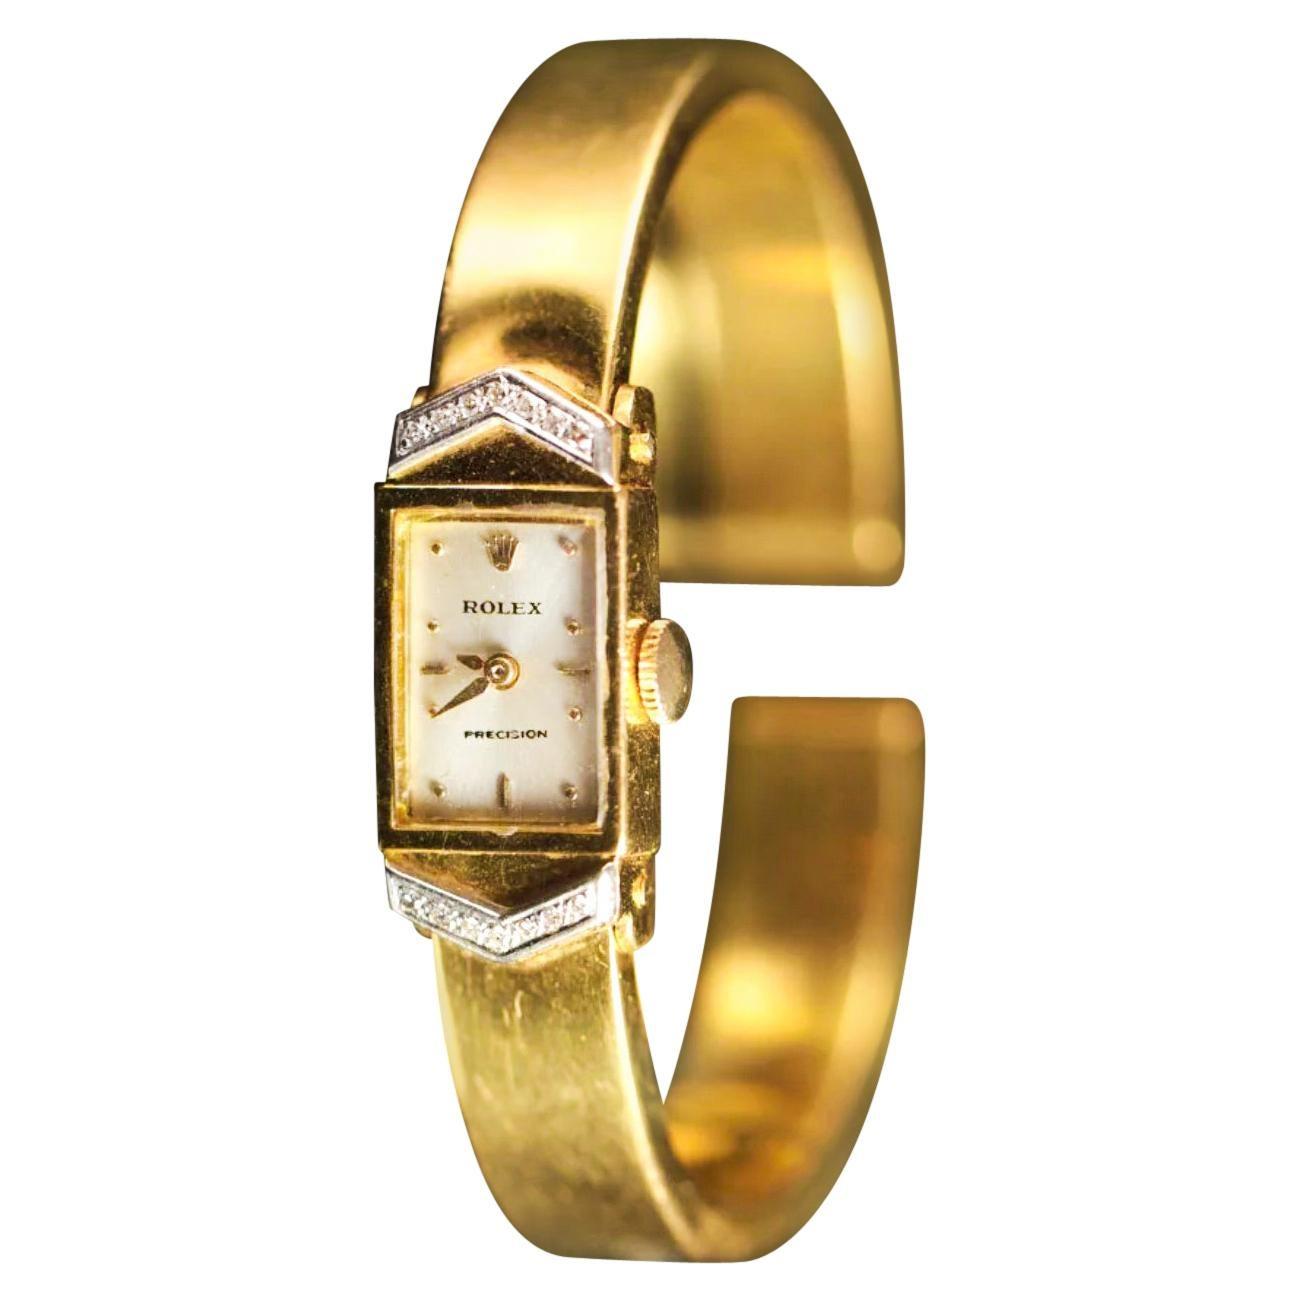 Rolex 1970s Precision 18 Karat Yellow Gold Diamond Bracelet Watch